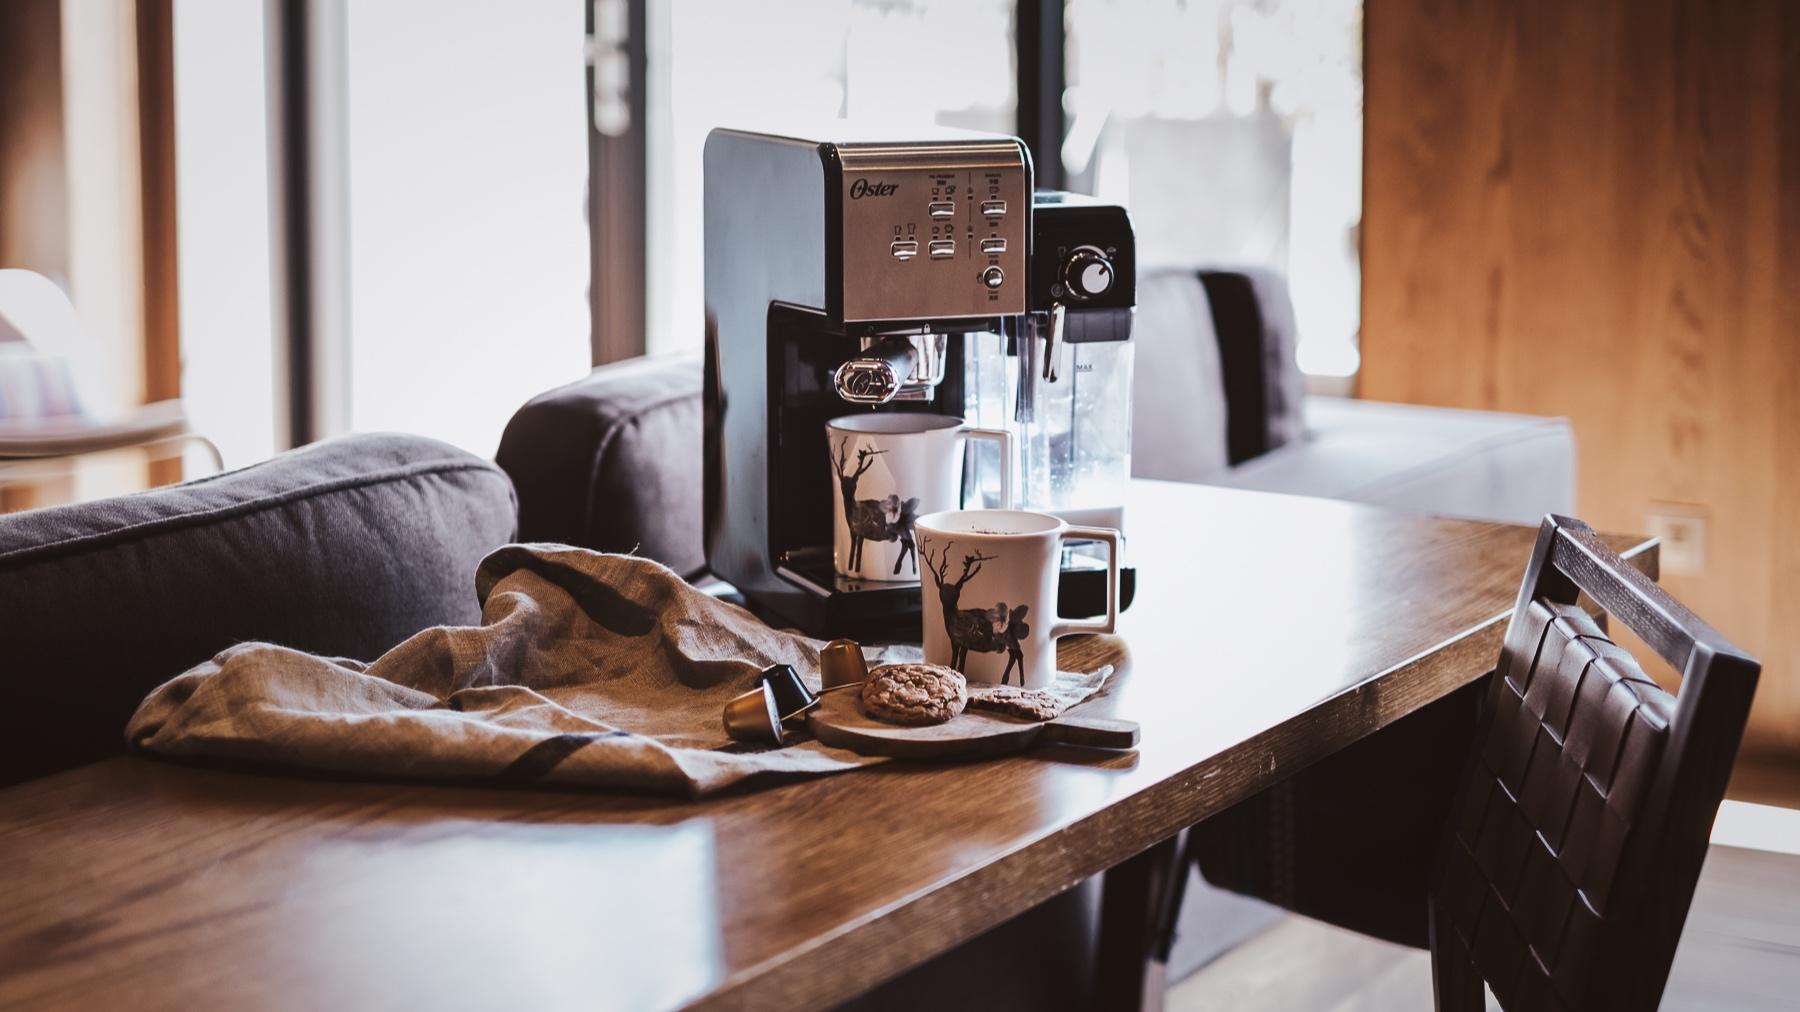 Oster+Caffee+Machine+-+HengStyle+%E6%81%86%E9%9A%86%E8%A1%8C+-+FUJIfilm+X-T3+XF3514+-+Yes%21+Please+Enjoy-15.jpg